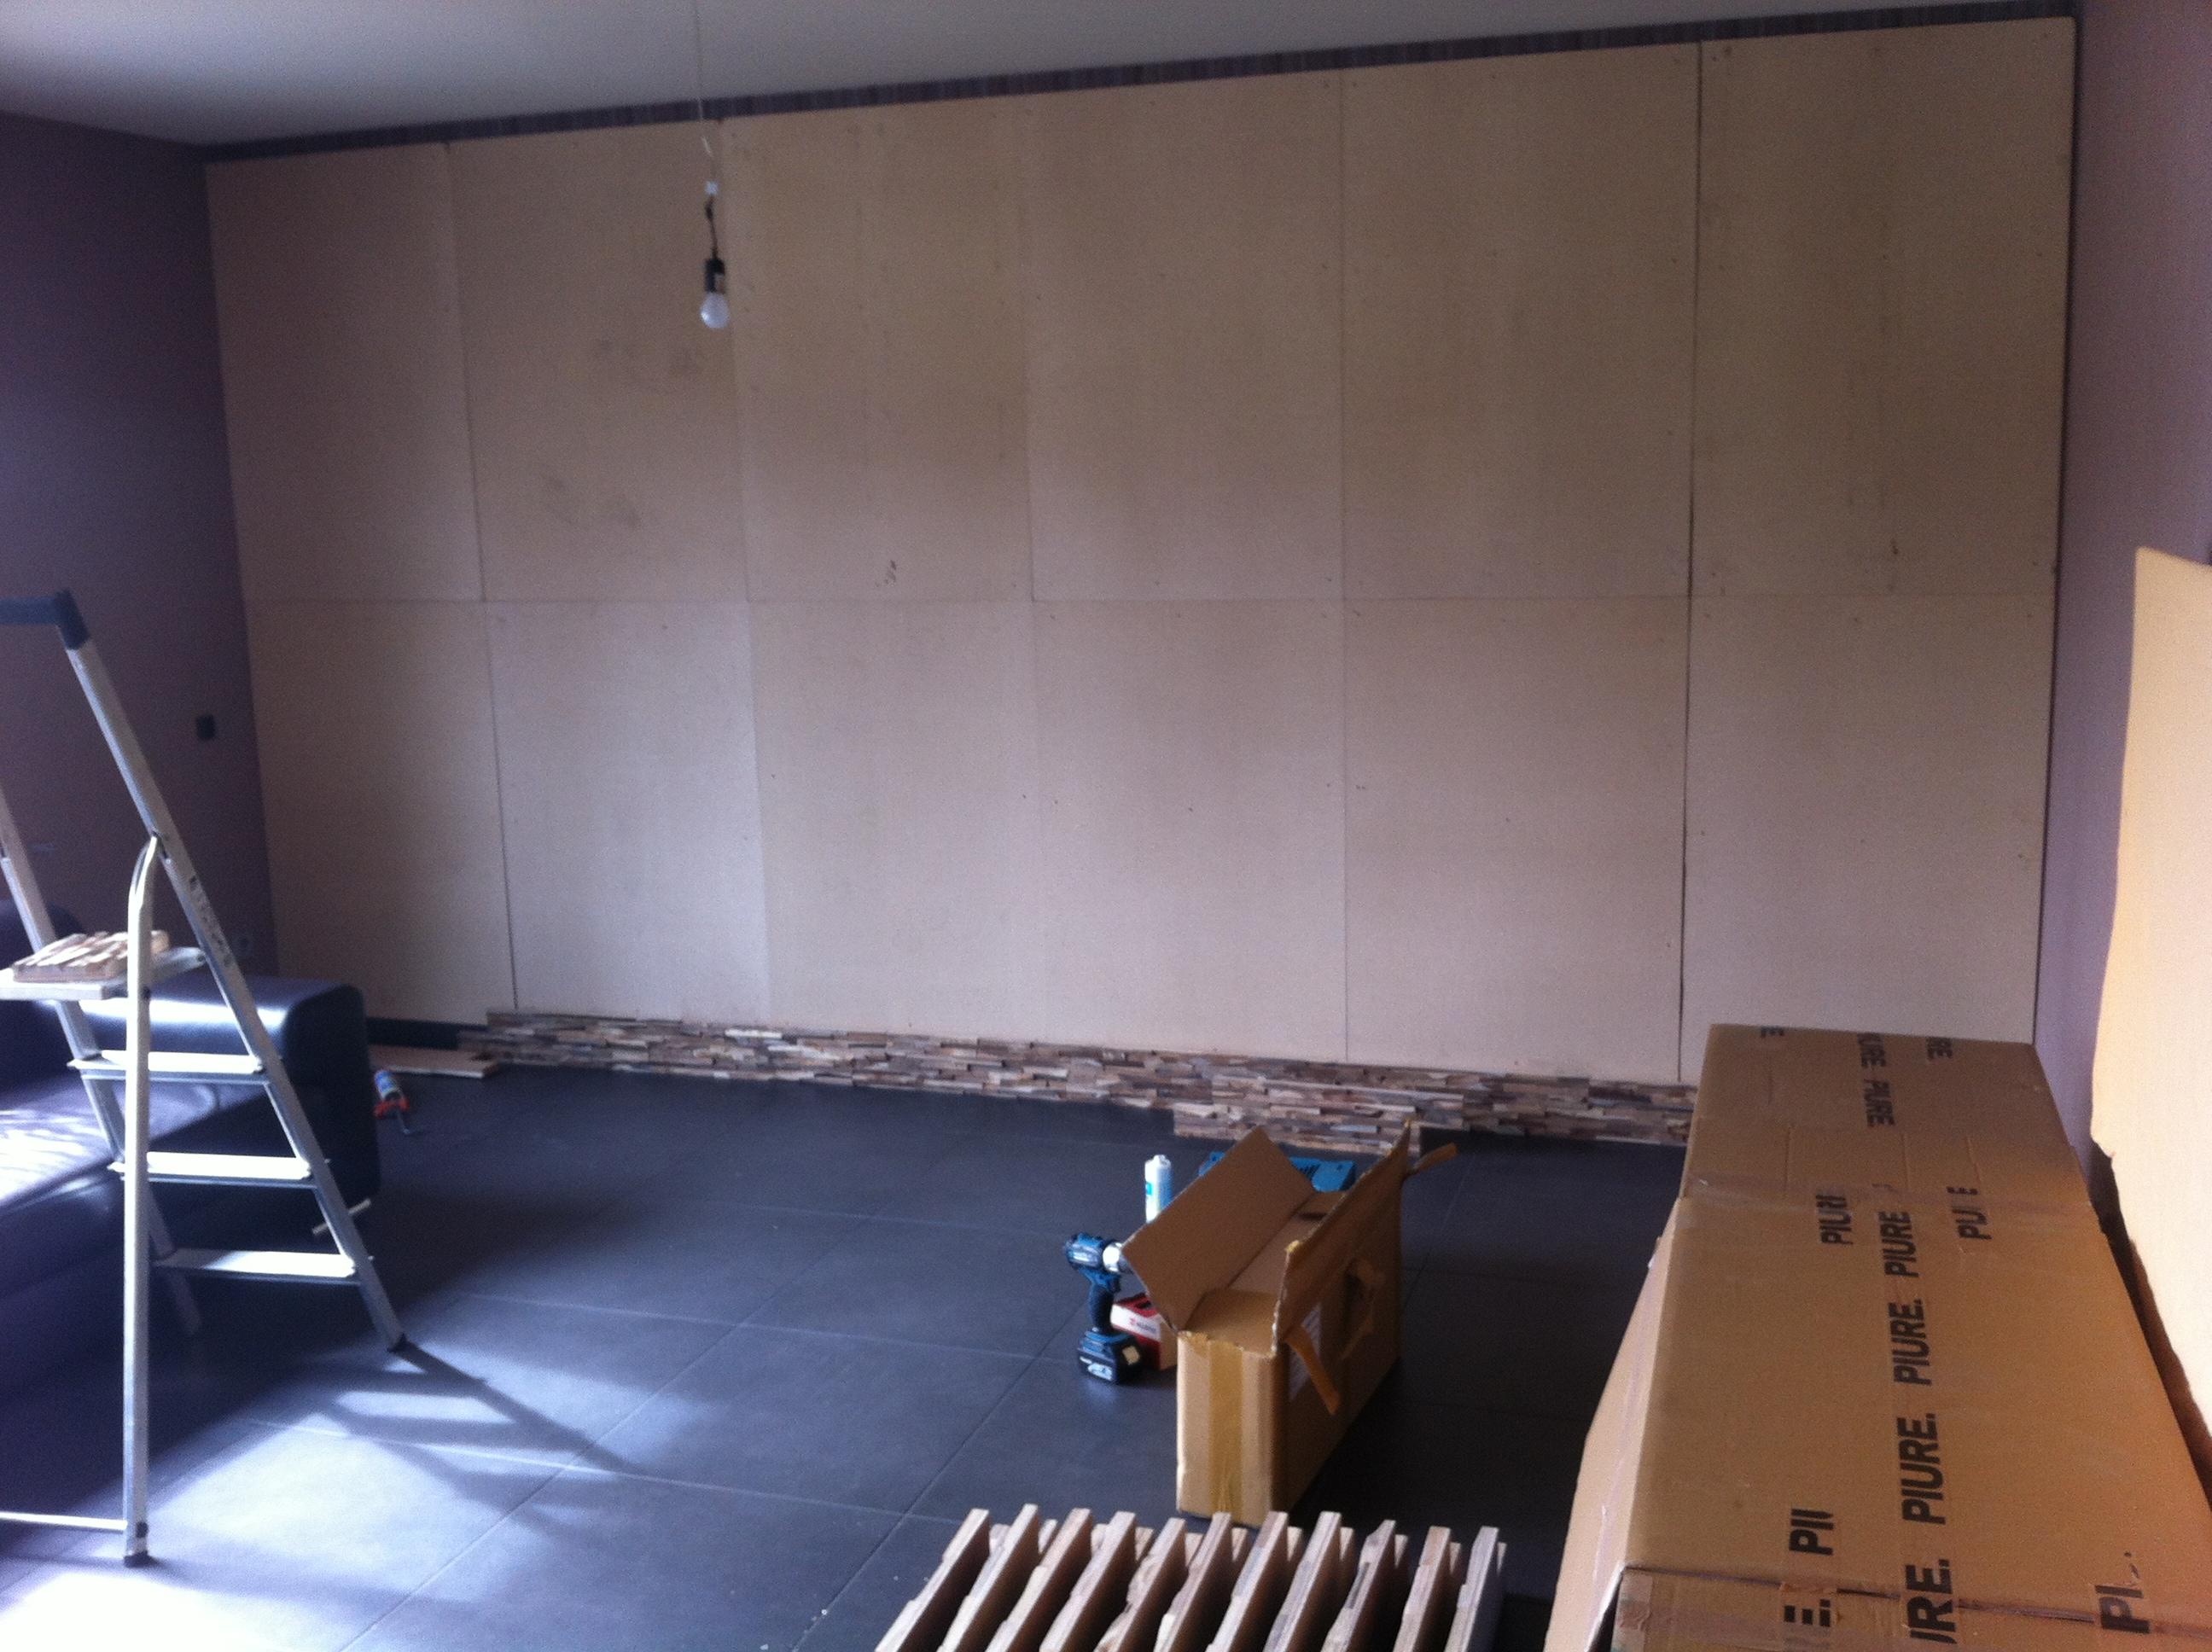 Holz Wandverkleidung Unterkonstruktion montiert